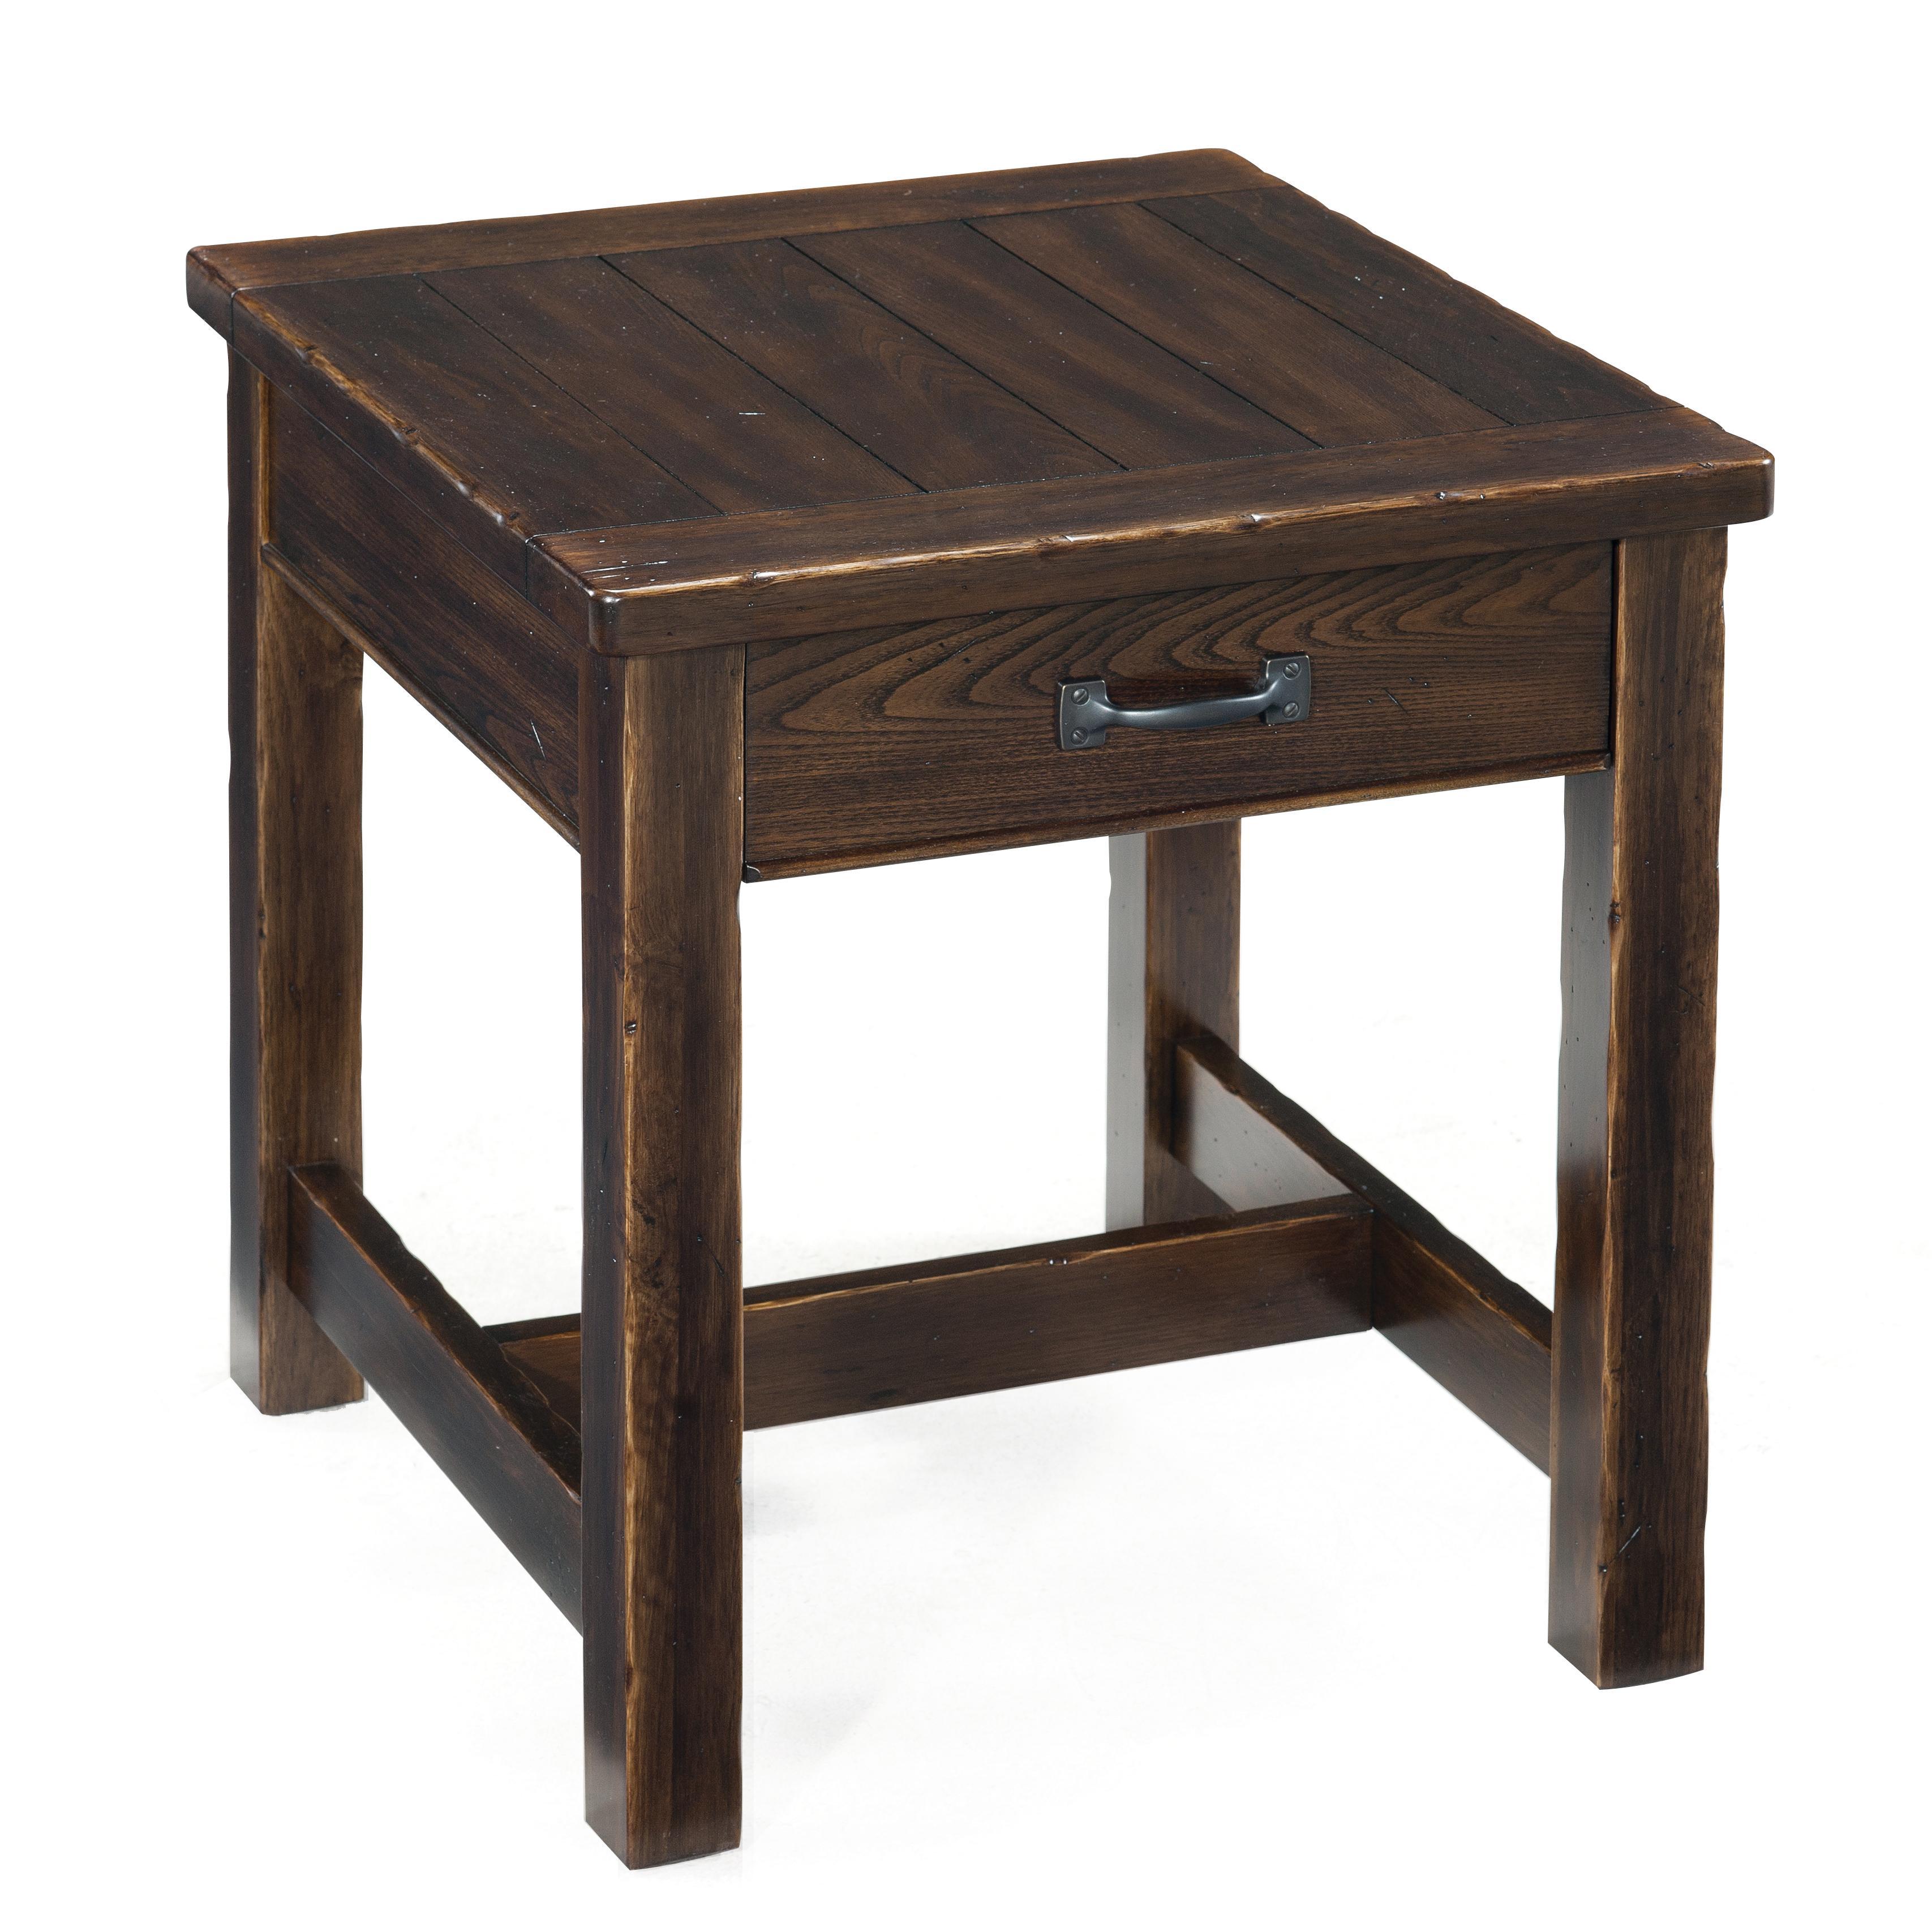 Belfort Select Kinderton Rectangular End Table - Item Number: T2398-03